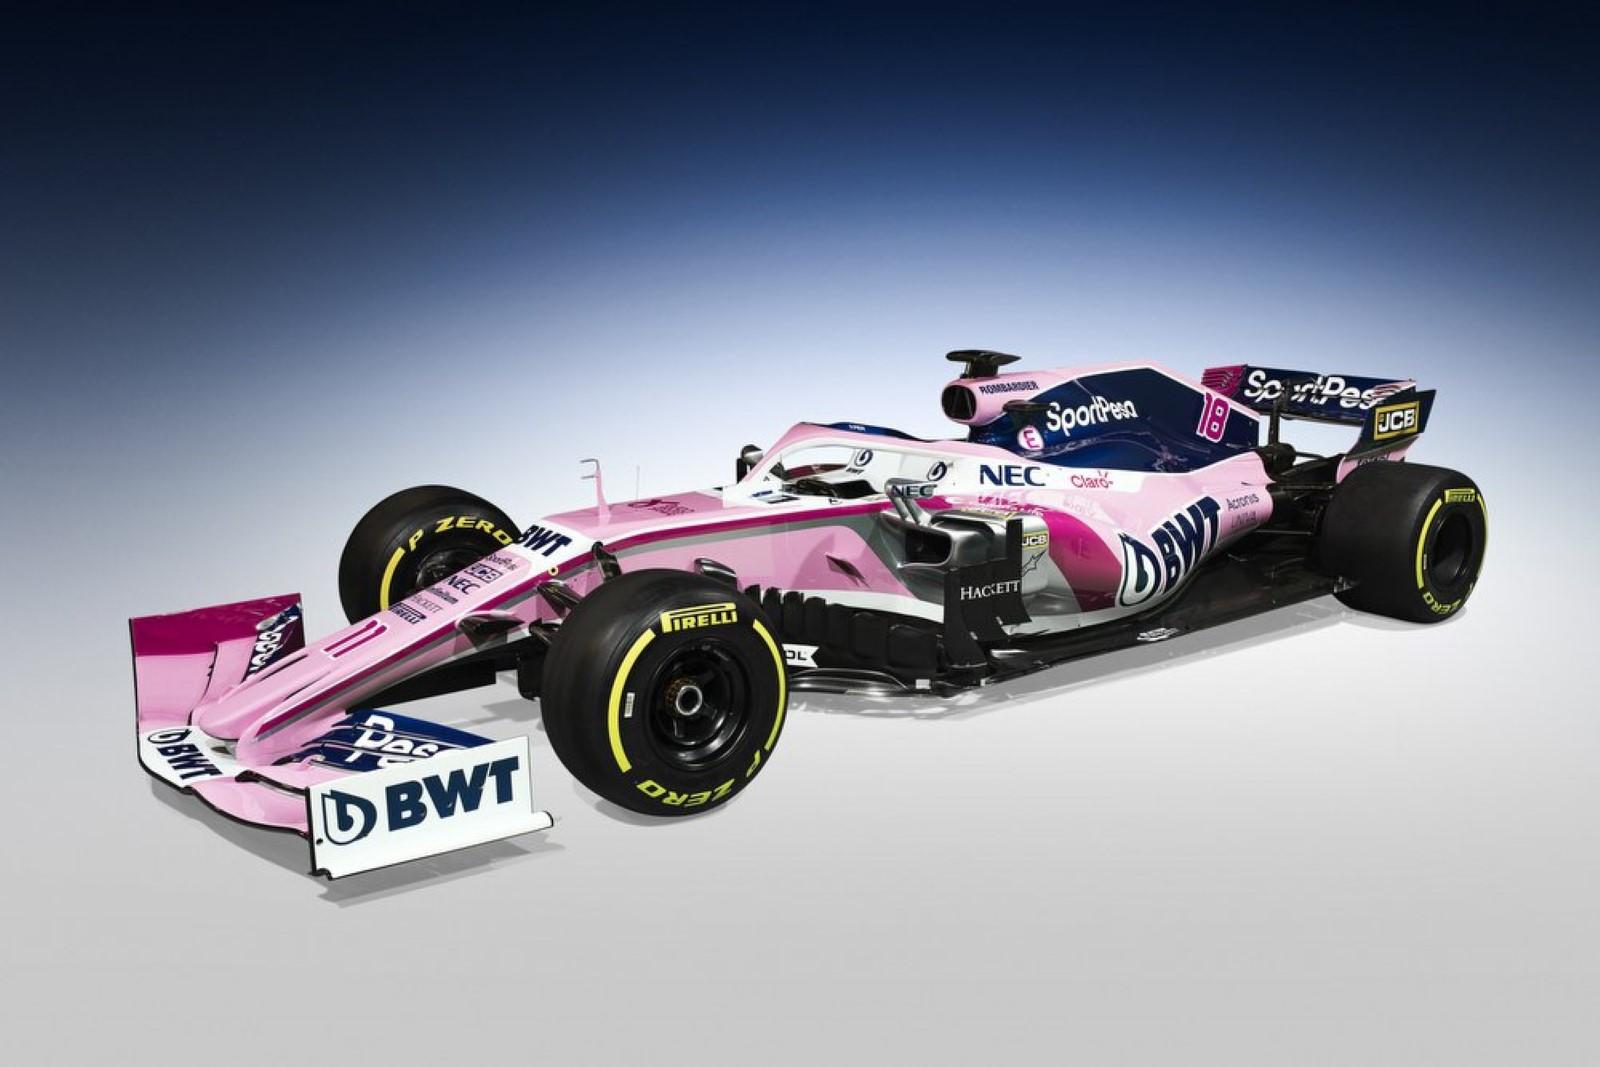 Racing Point екс Force India го претстави болидот за новата сезона